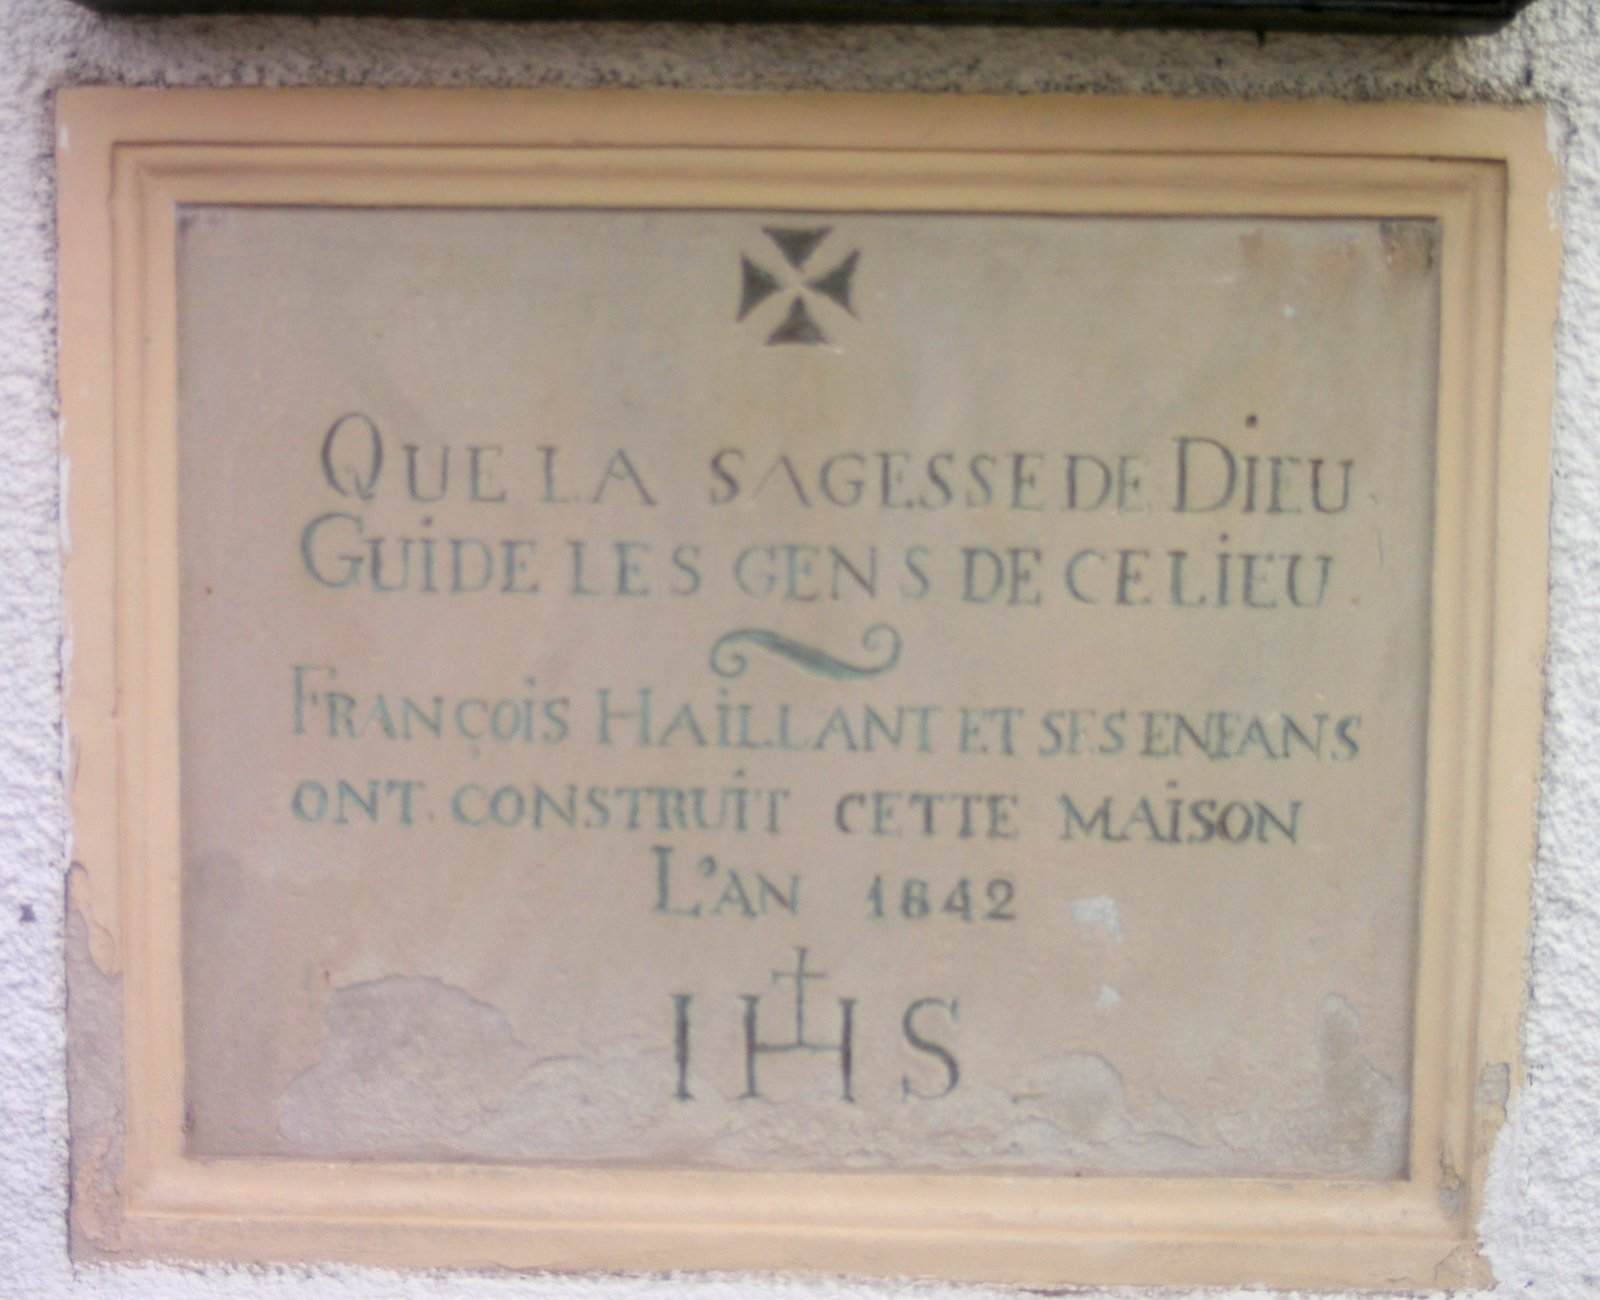 Pierre de fondation Nicolas François HAILLANT